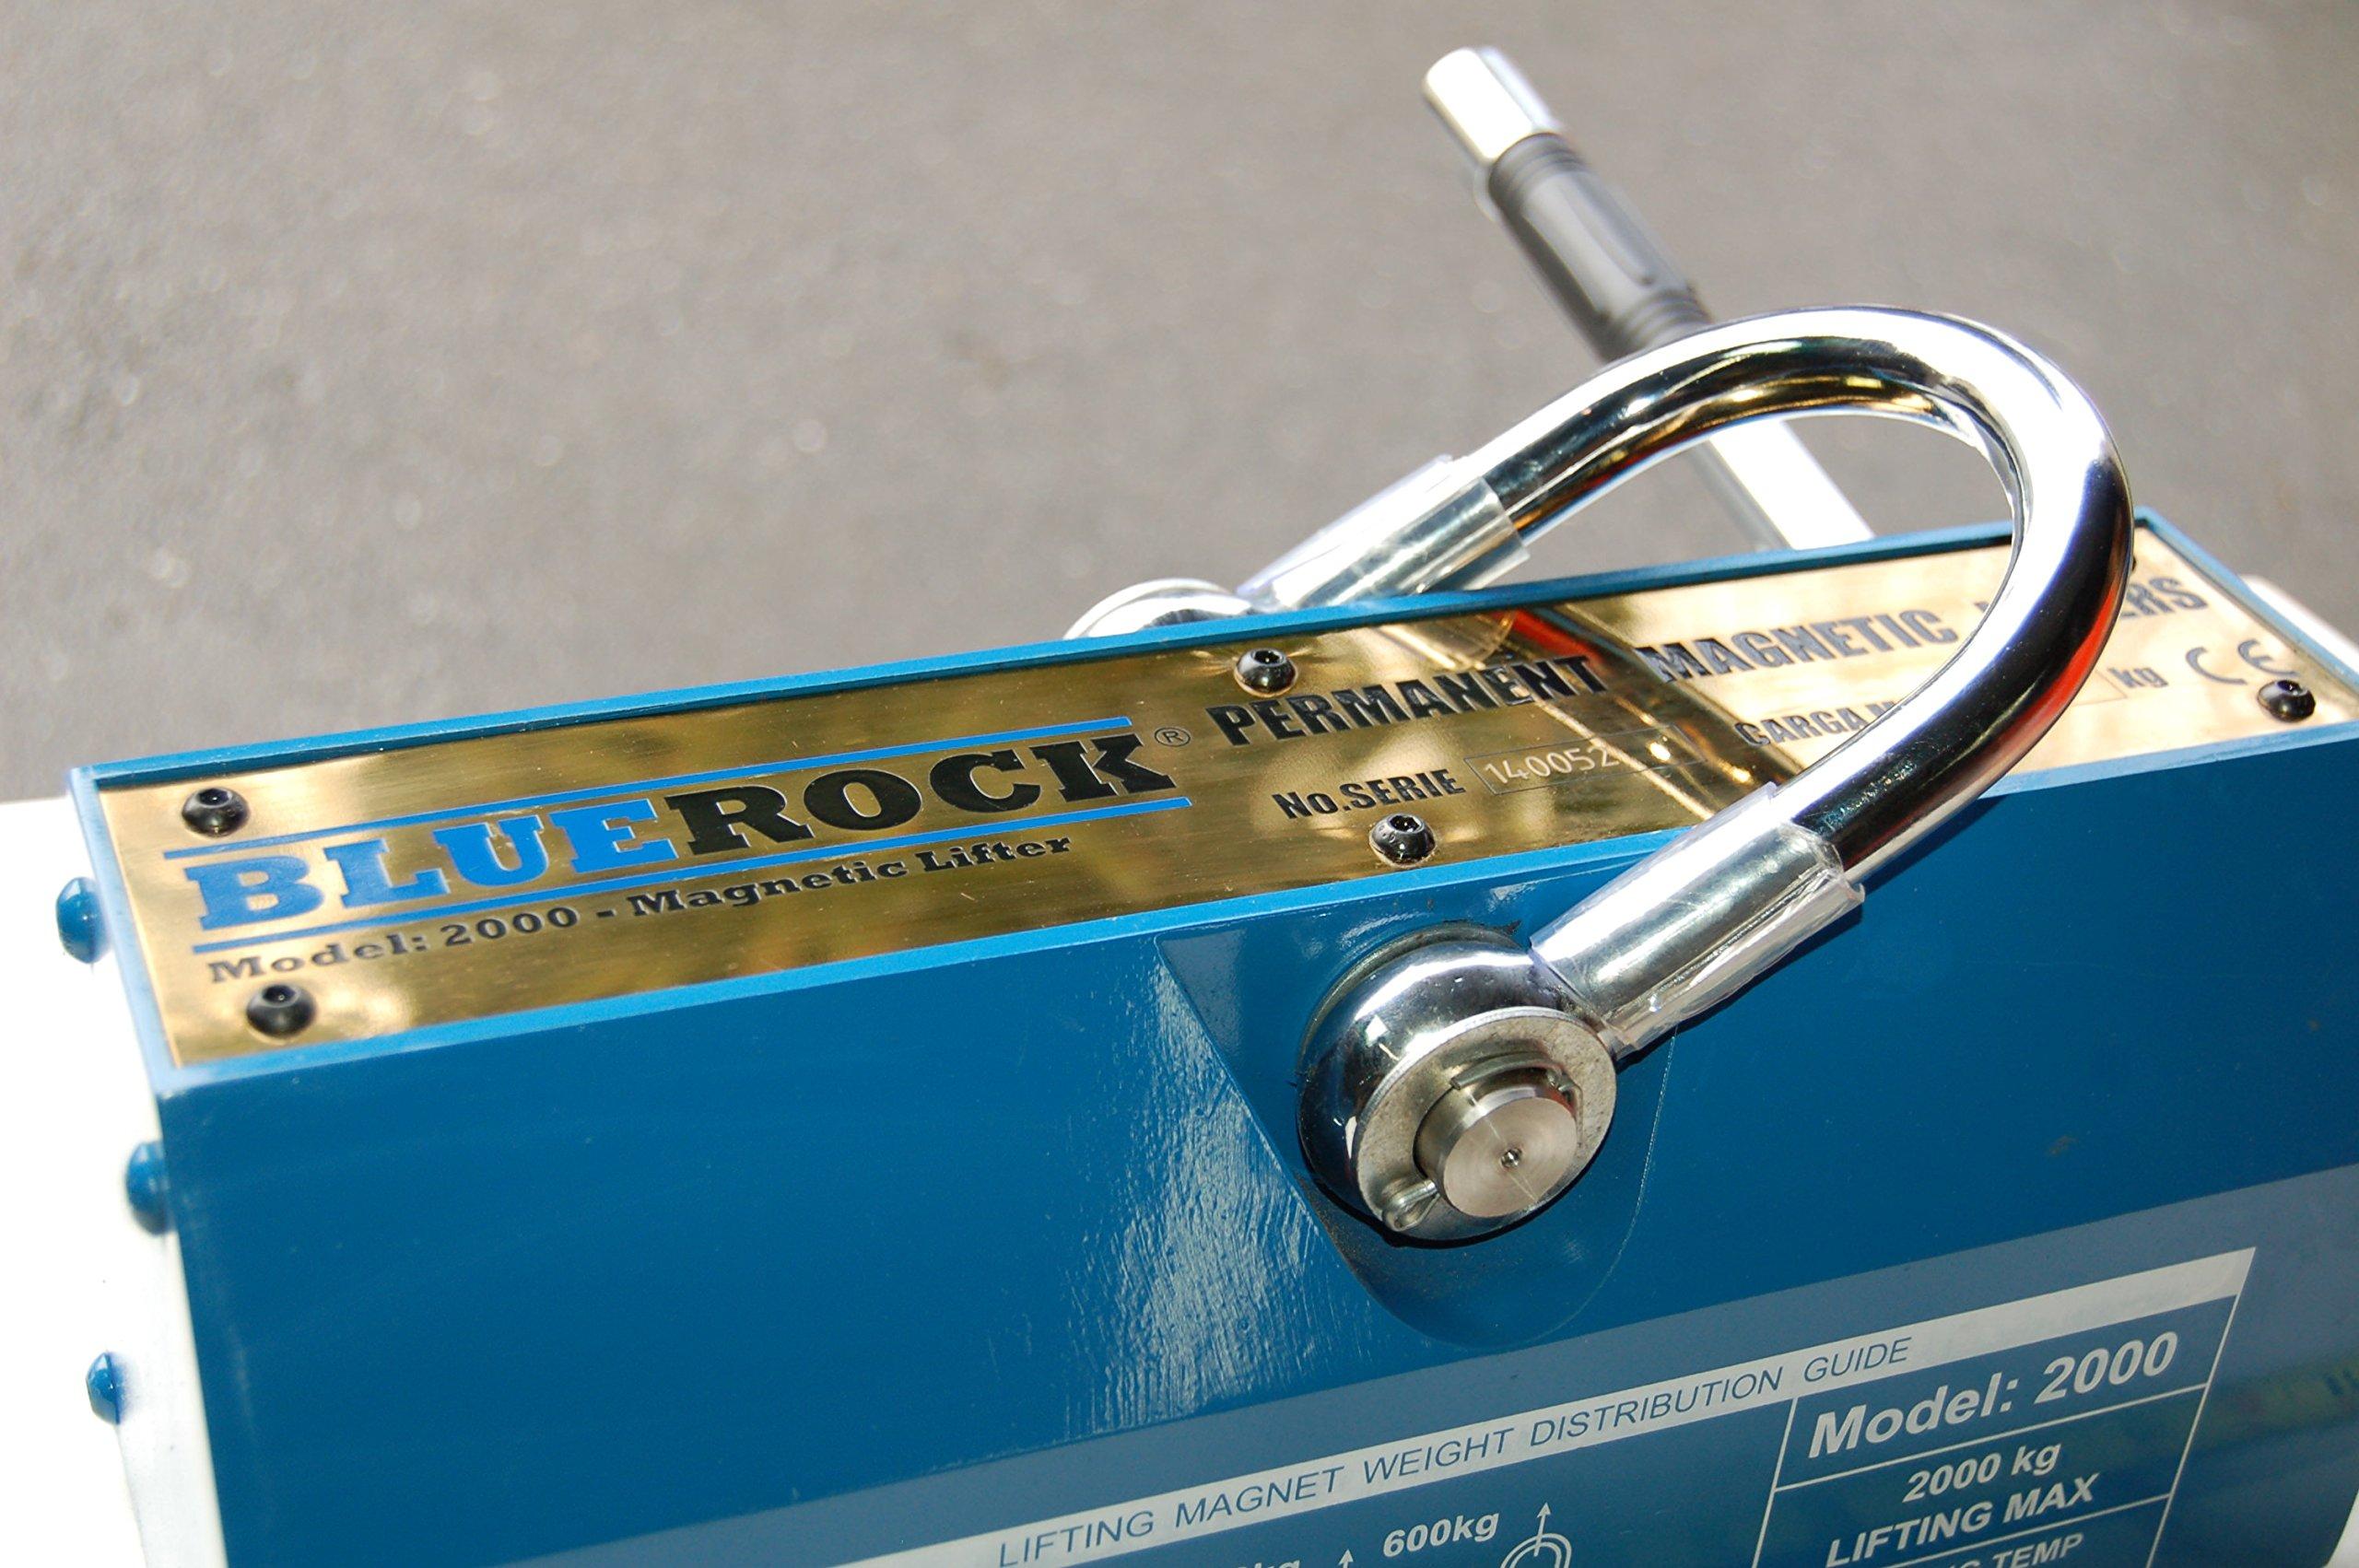 Magnetic Lifter 2000KG / 4400 LBS Magnet Lifting Mag Crain Hoist BLUEROCK Tools